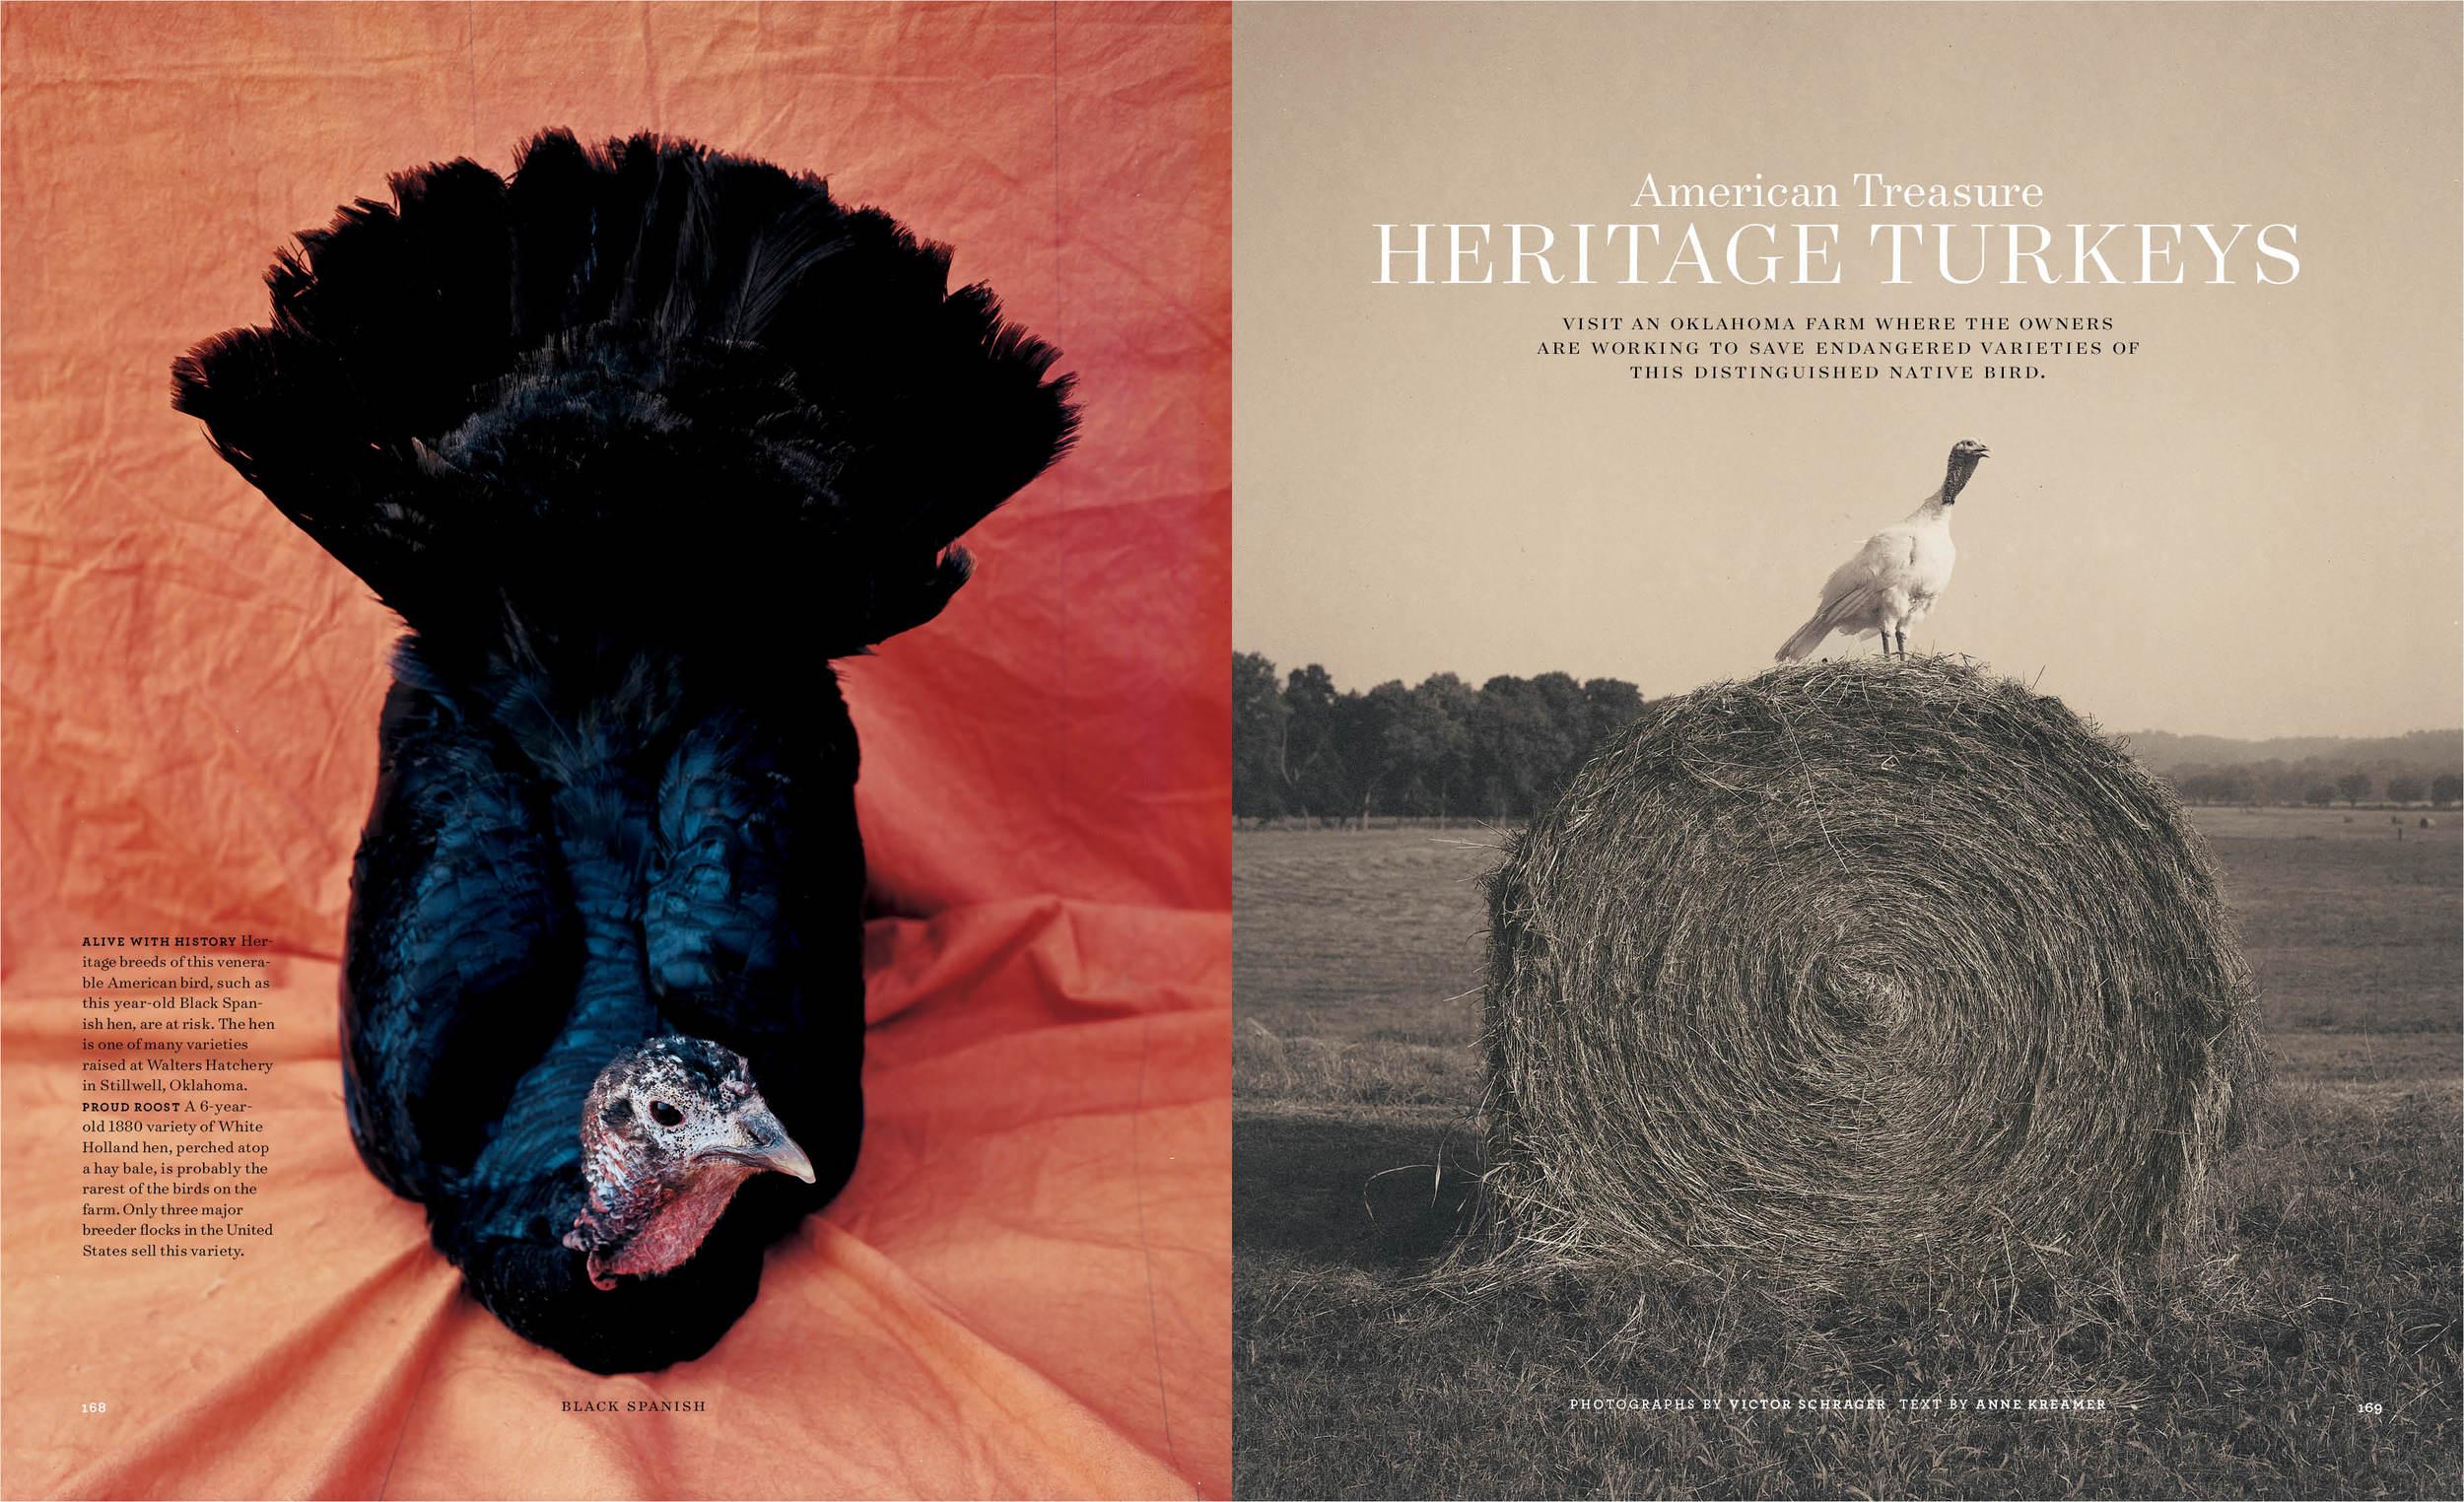 heritage turkeys copy.jpg